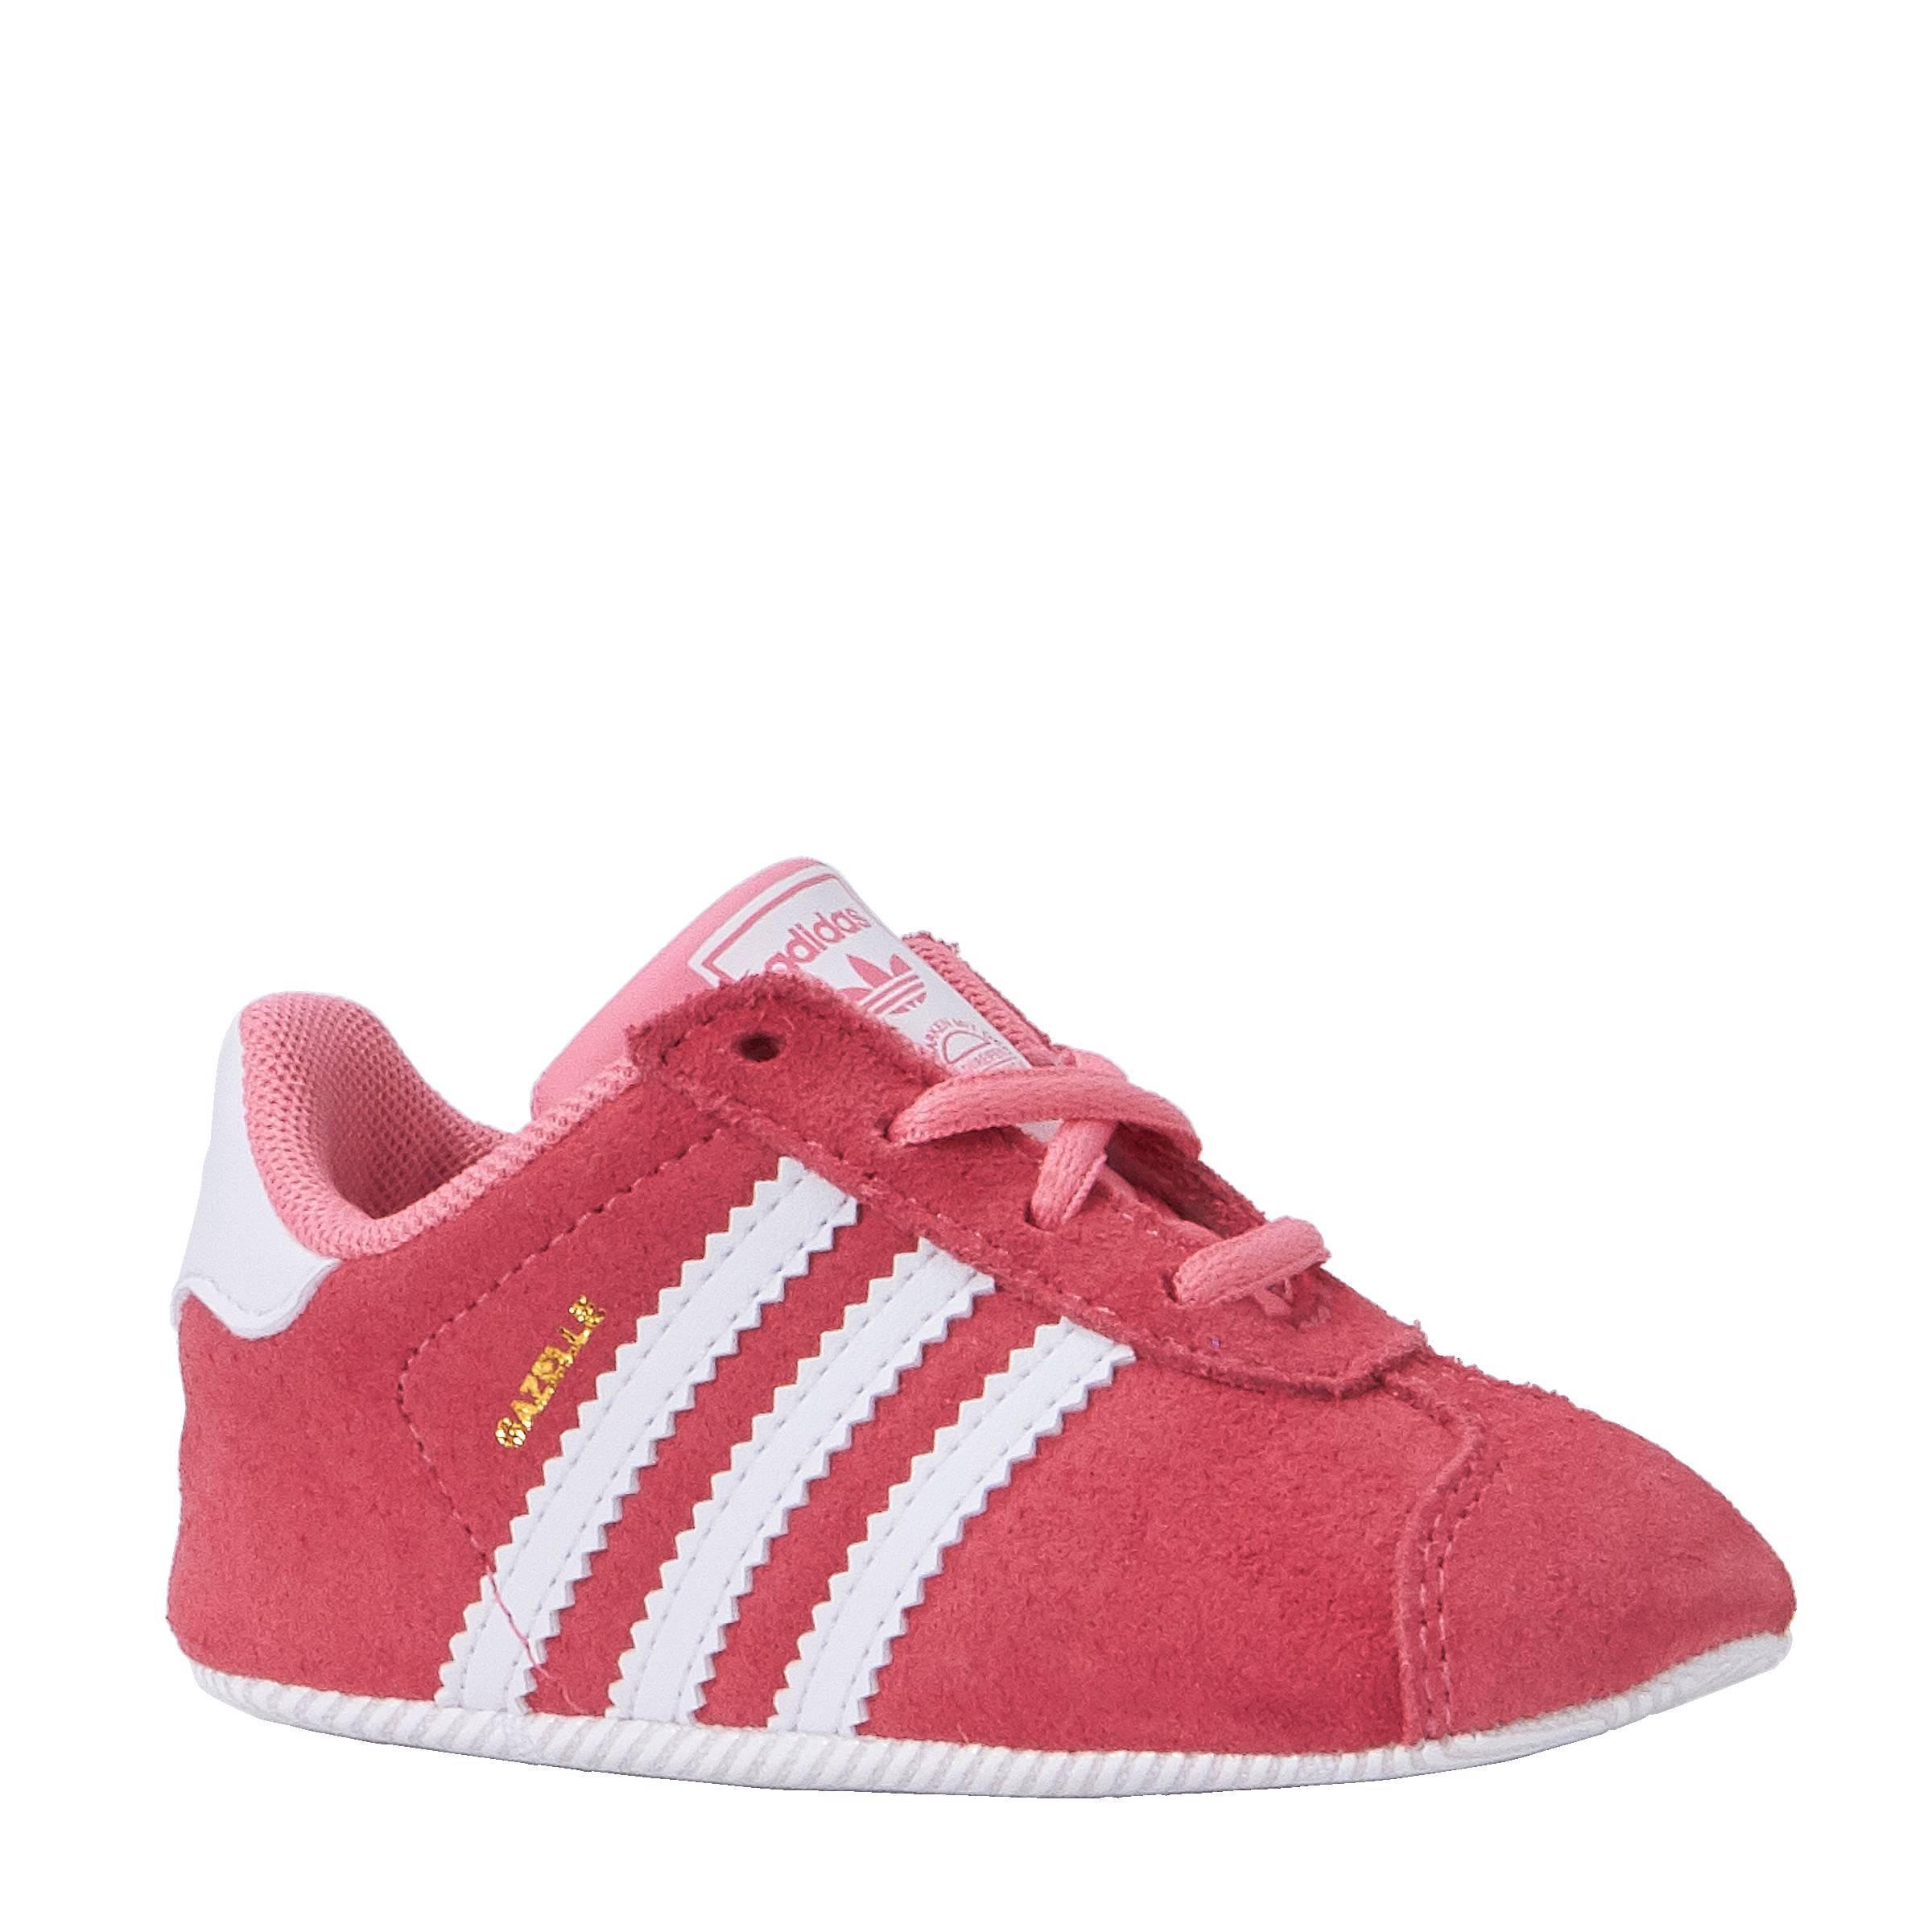 adidas babyschoen roze